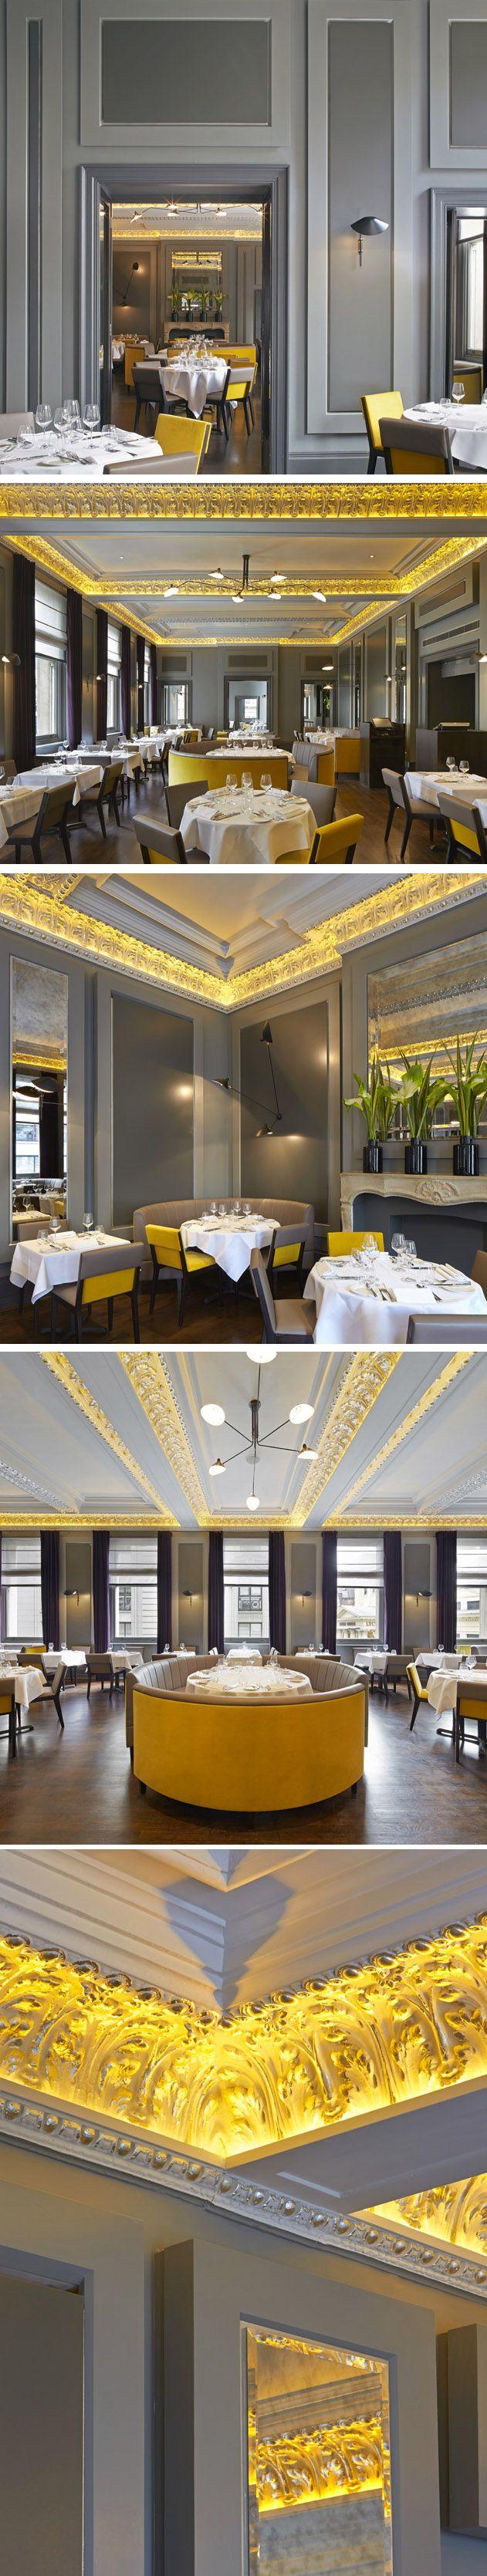 Christopher's  Martini Bar and Restaurant in London :: De Matos Ryan.....